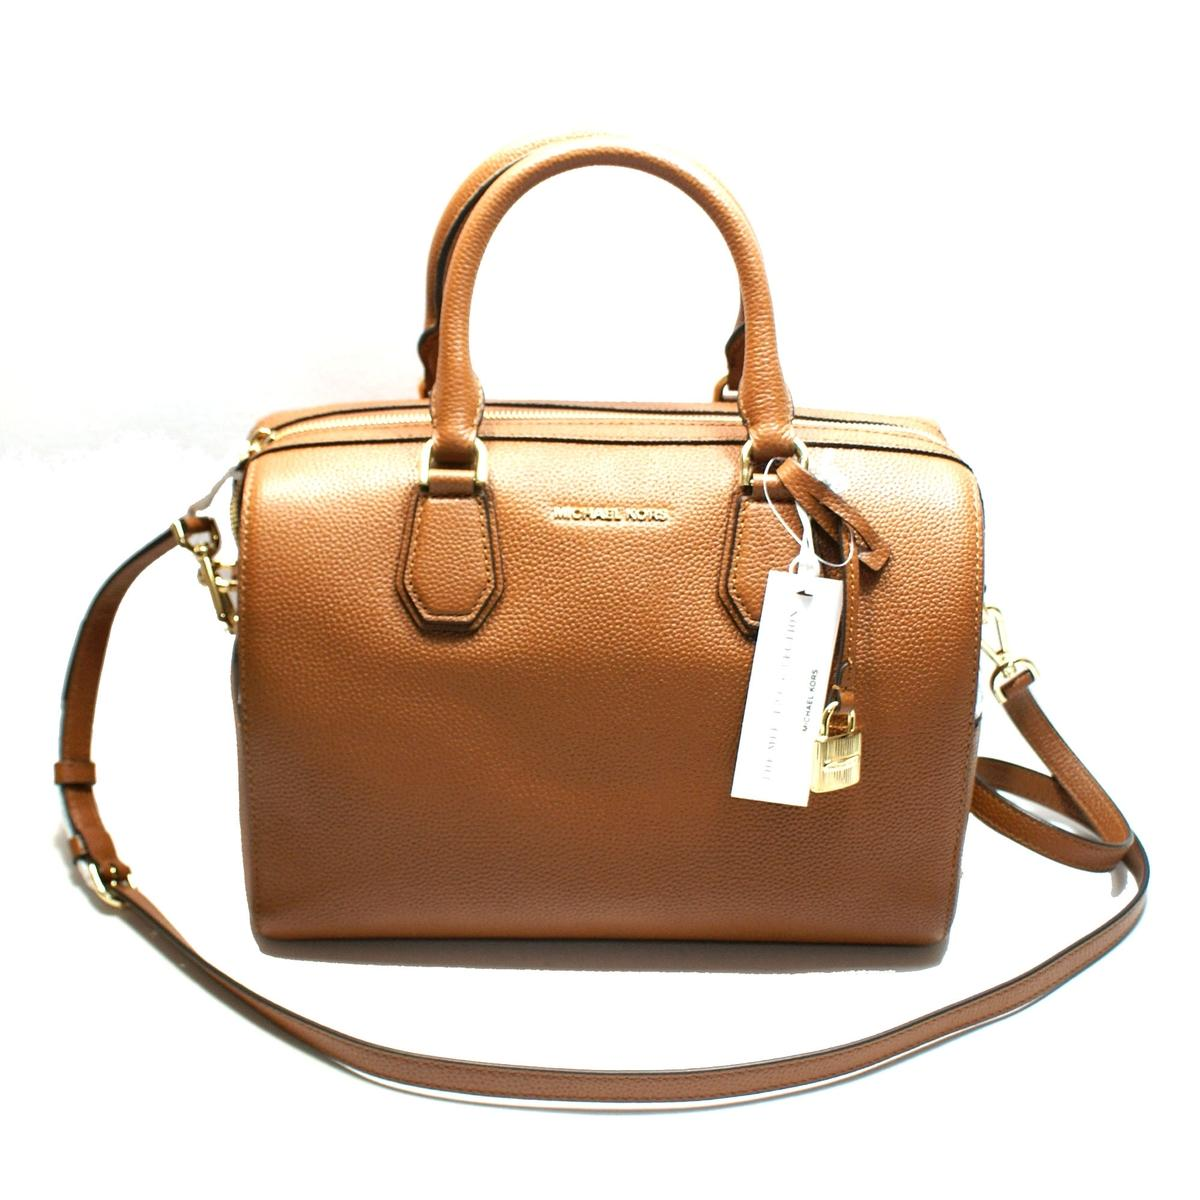 99b67d6d41662 Home · Michael Kors · Mercer Medium Duffle Leather Luggage Satchel  Crossbody  Bag. CLICK THUMBNAIL TO ZOOM. Found In  Handbags